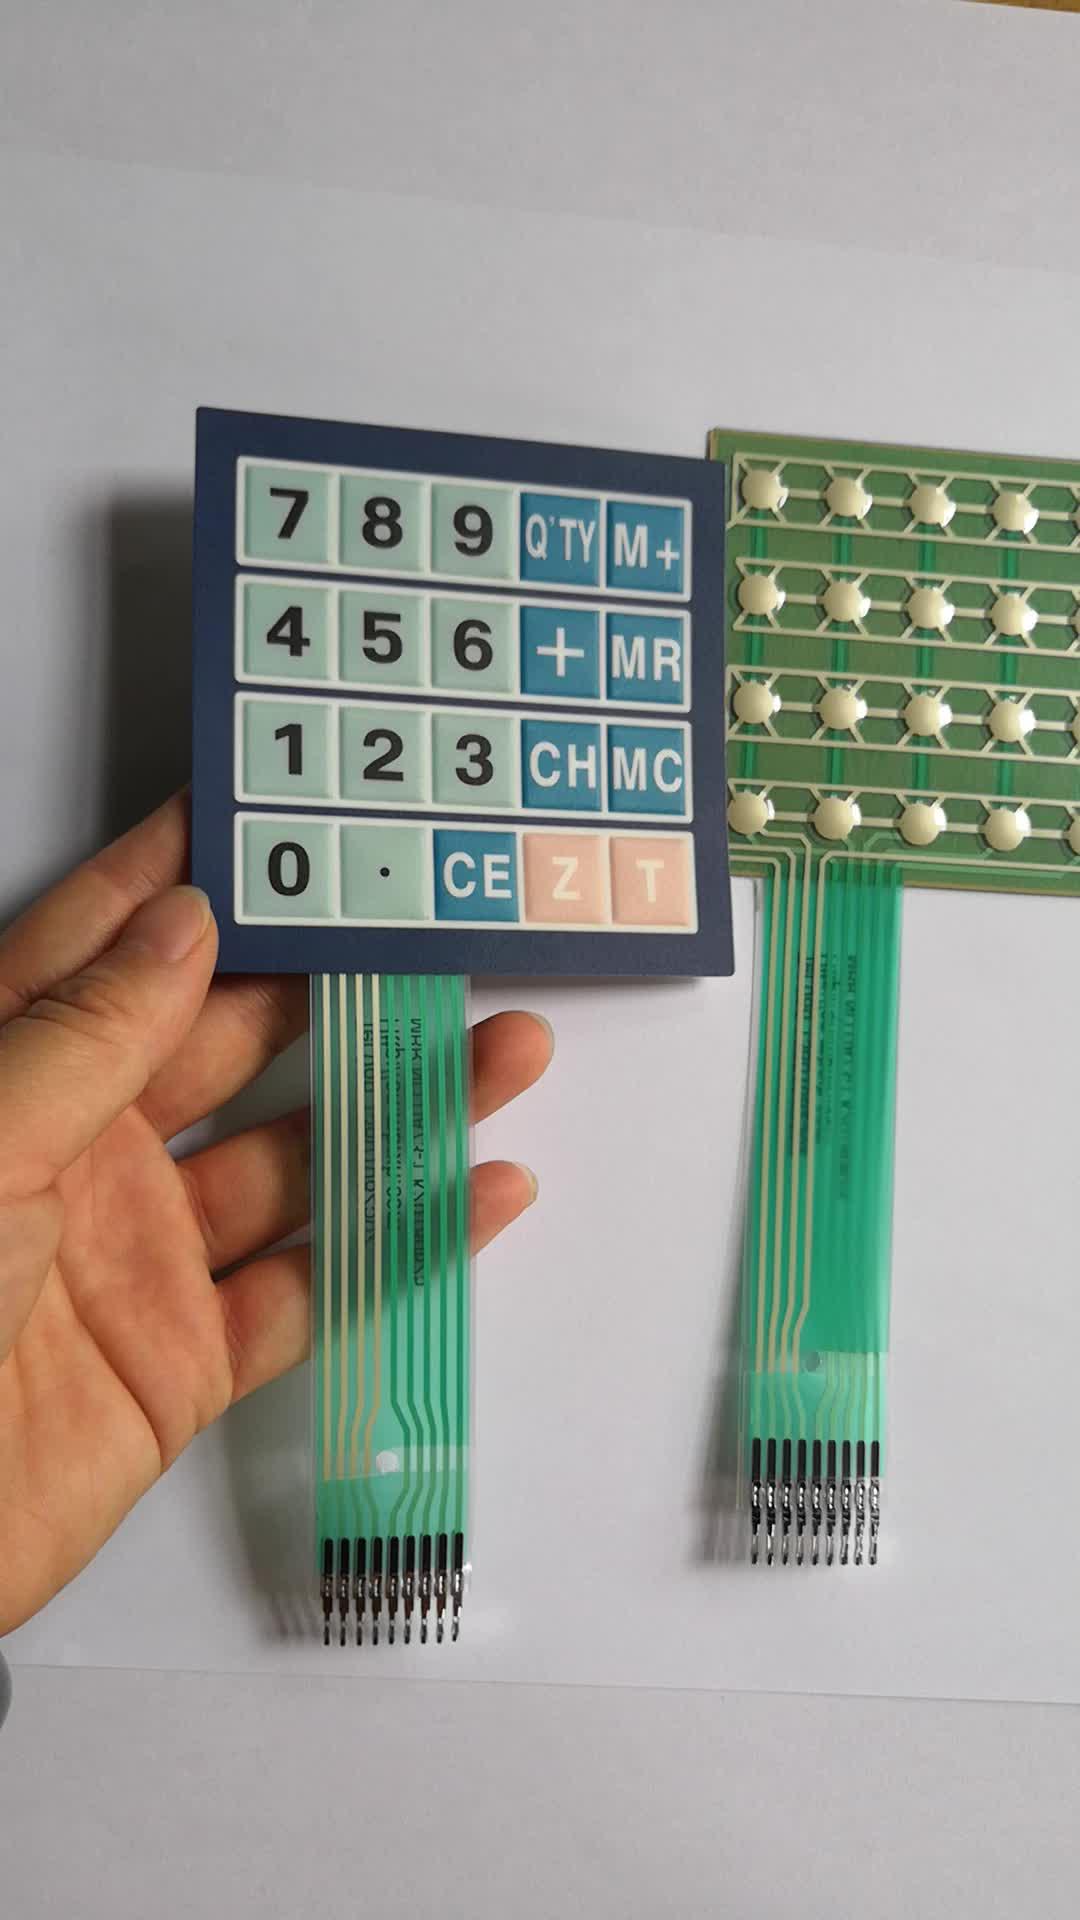 OEM ODM Service Colorful Membrane Switch Keypad For Matrix Remote Controller